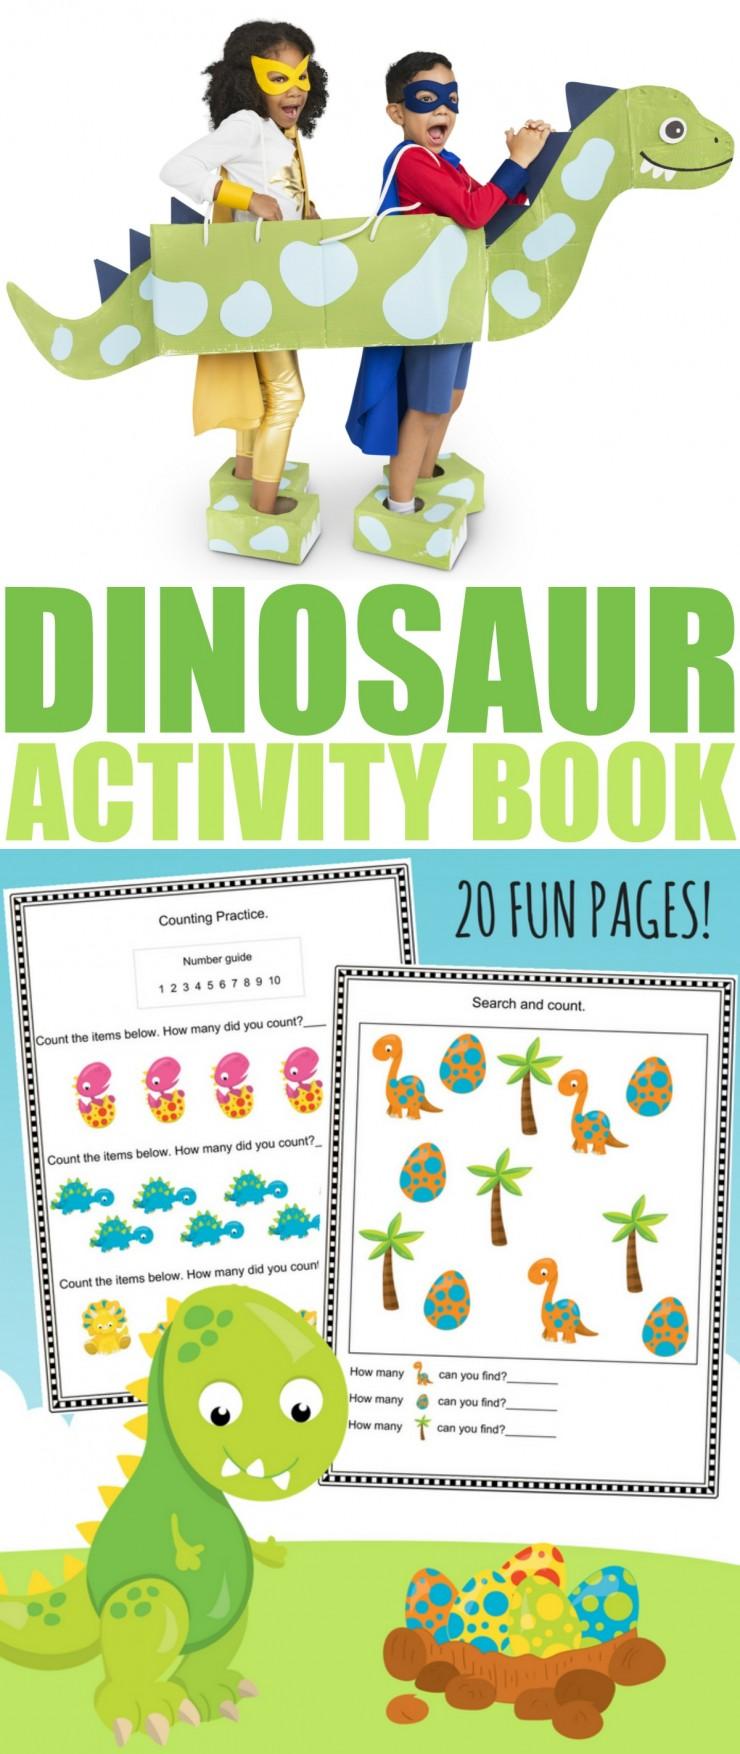 medium resolution of Free Printable Dinosaur Activity Book - Frugal Mom Eh!